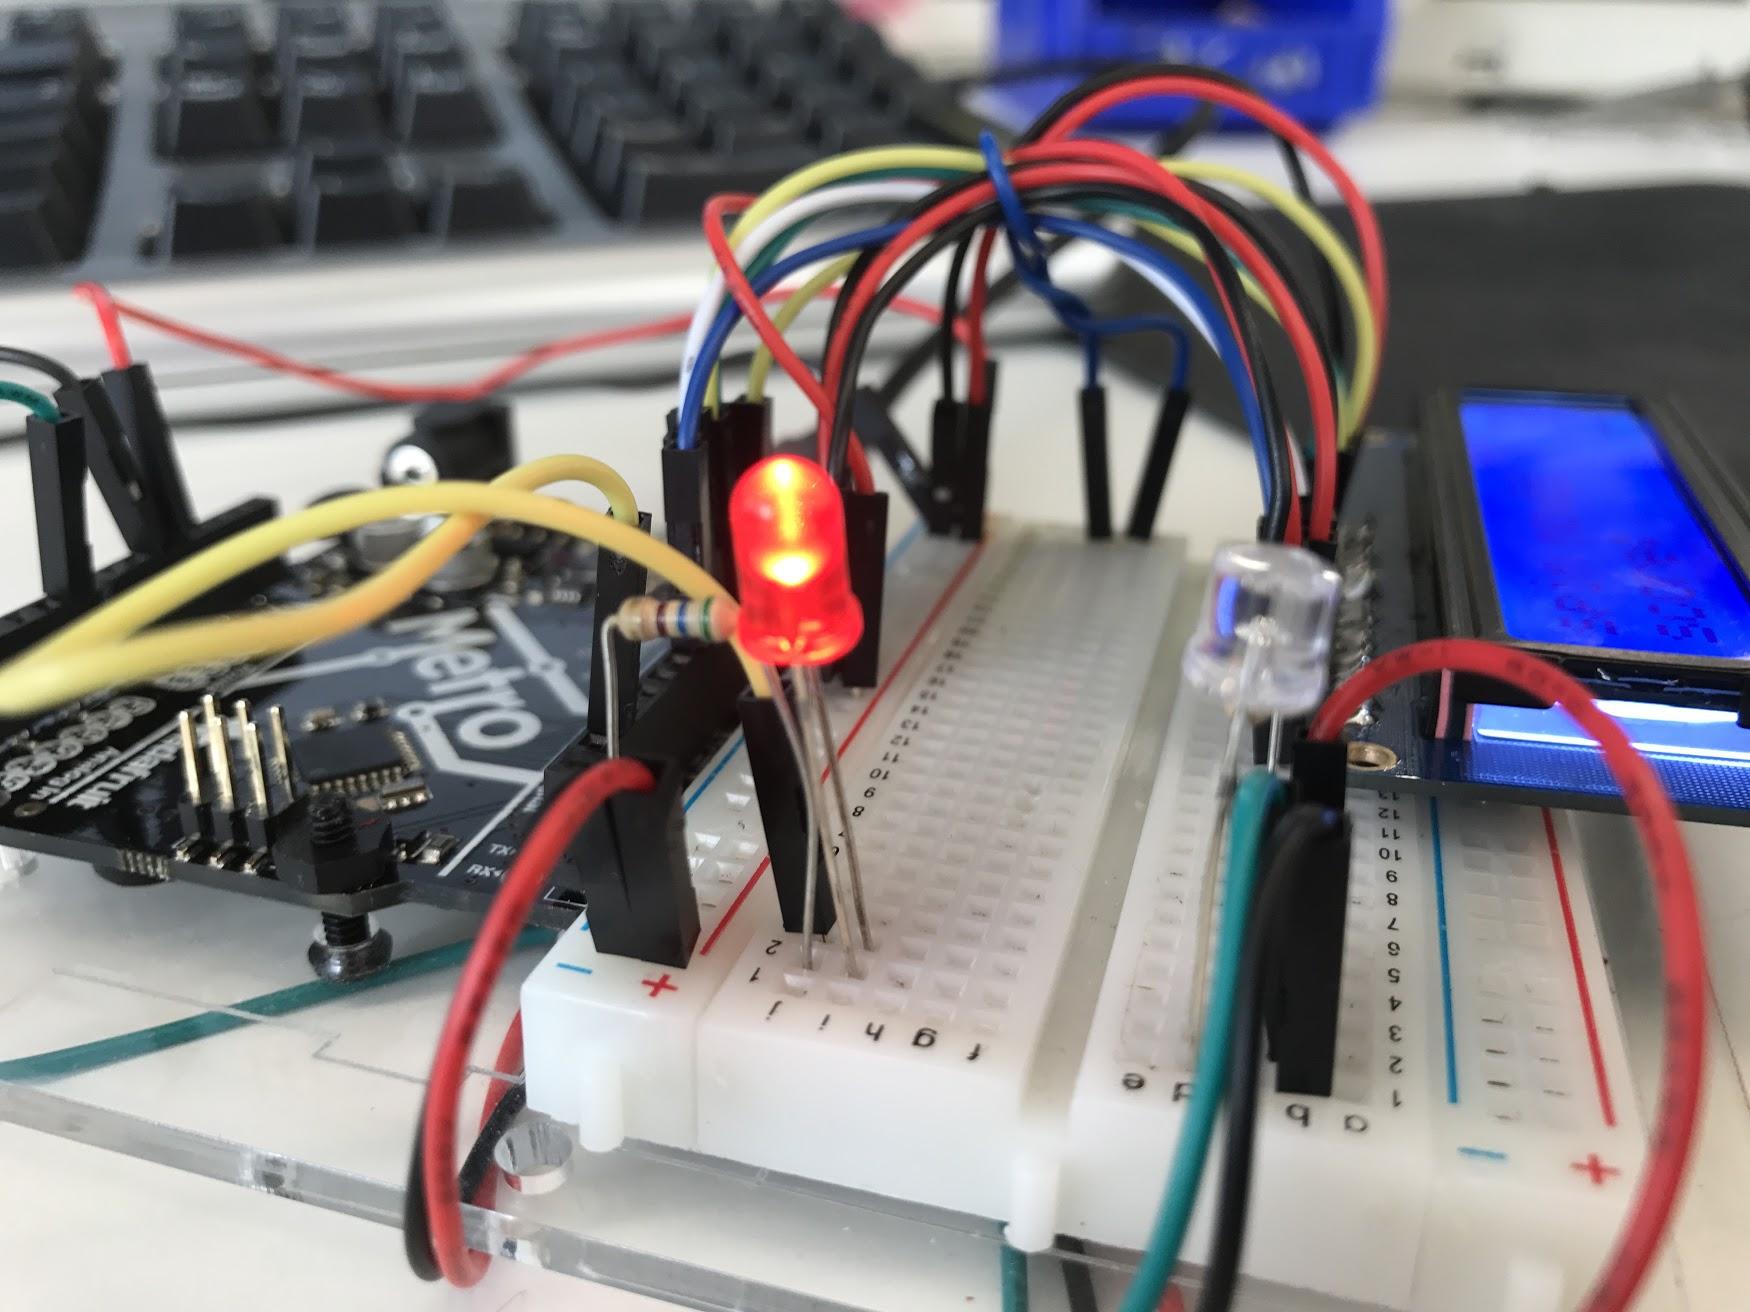 sensors_adafruit_products_IMG_2847.jpg